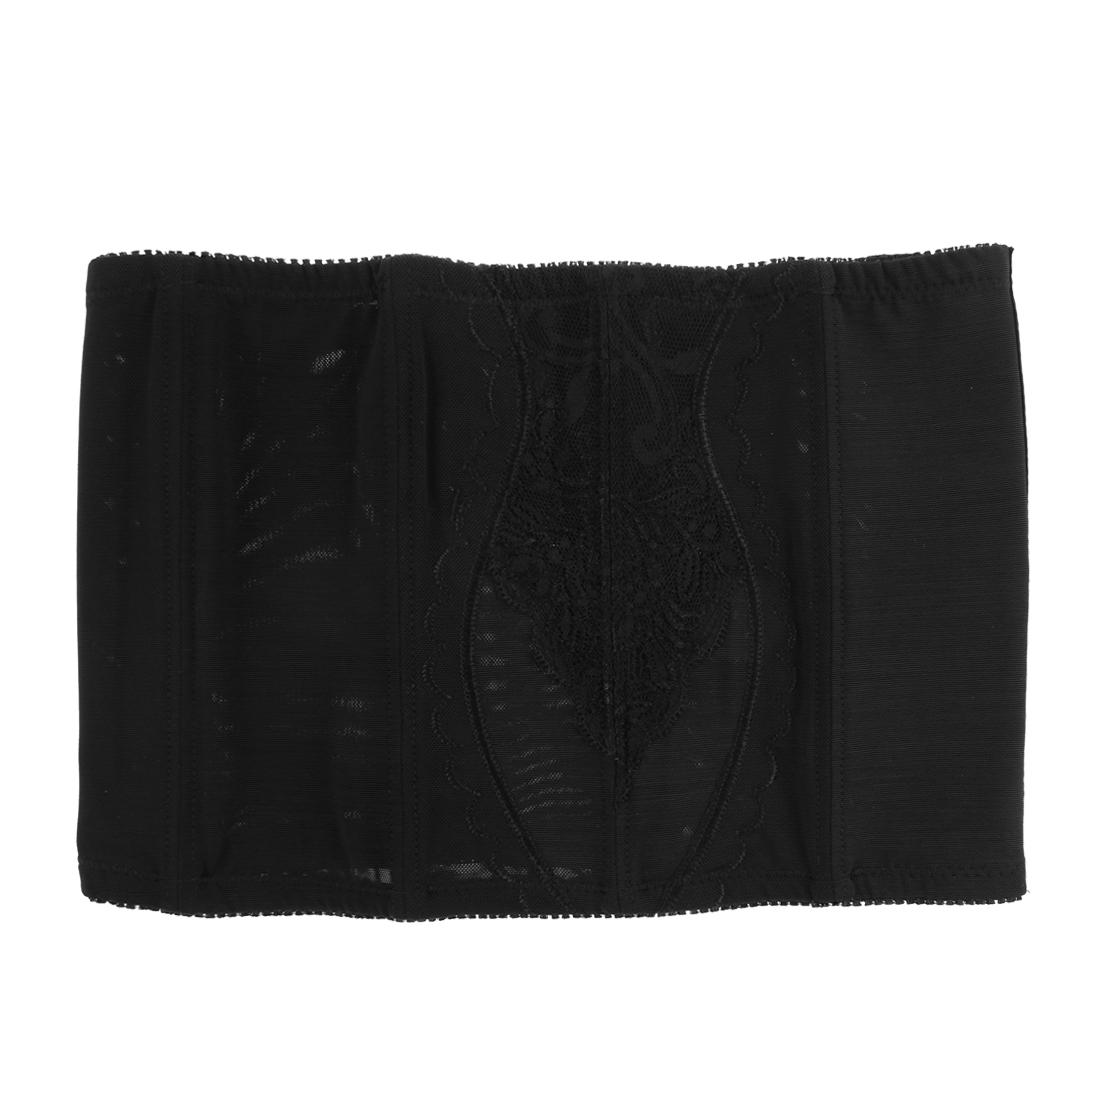 Lady Adjustable Stretchy Tummy Trimmer Corset Shapewear Waistband Cincher Black M